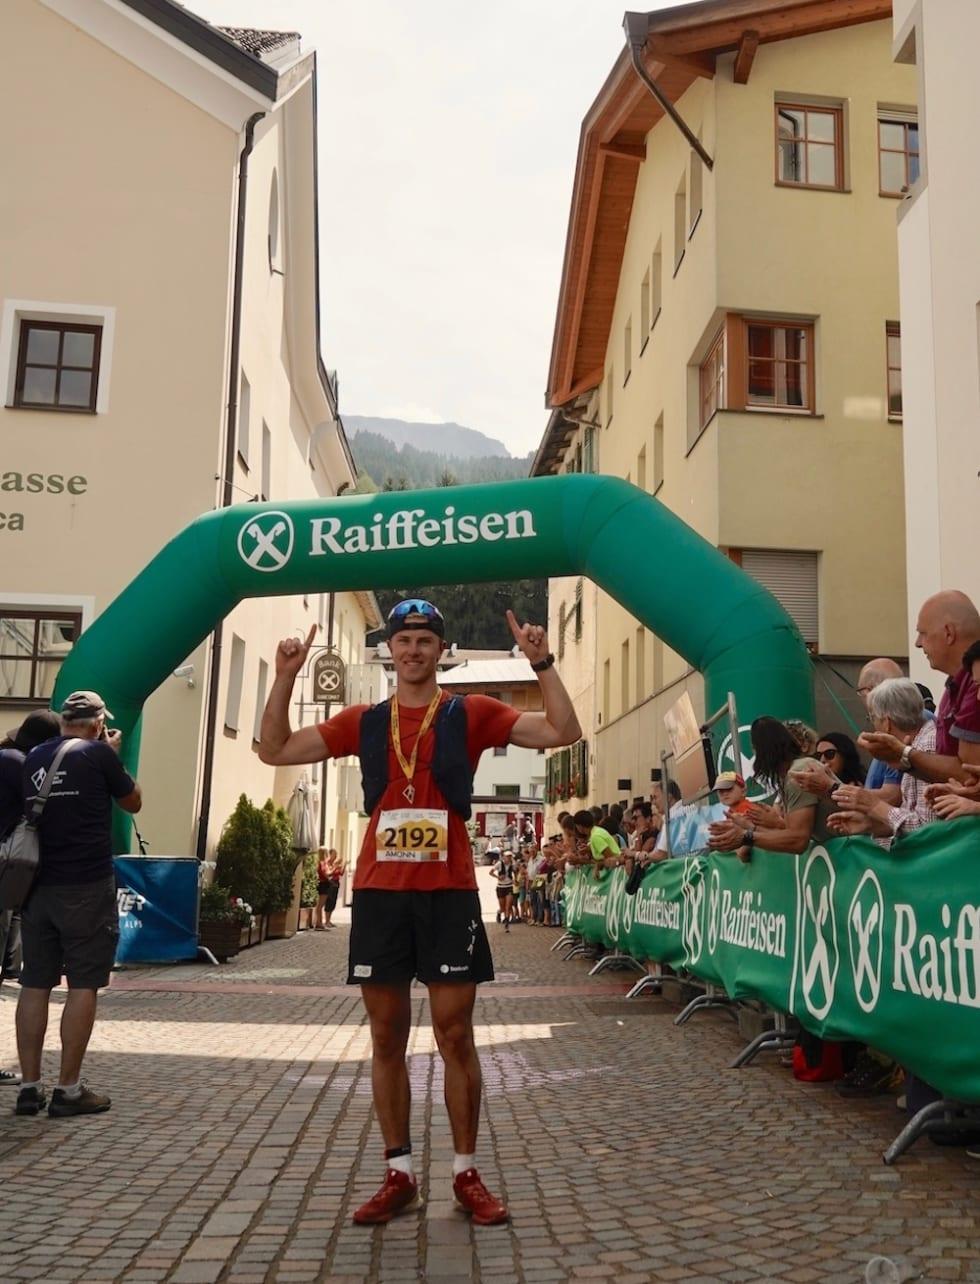 Kristian André Aalerud etter målgang på maratondistansen i Südtirol Ultra Sky Race i Bolzano i går. Foto: Anniken Helene Aalerud